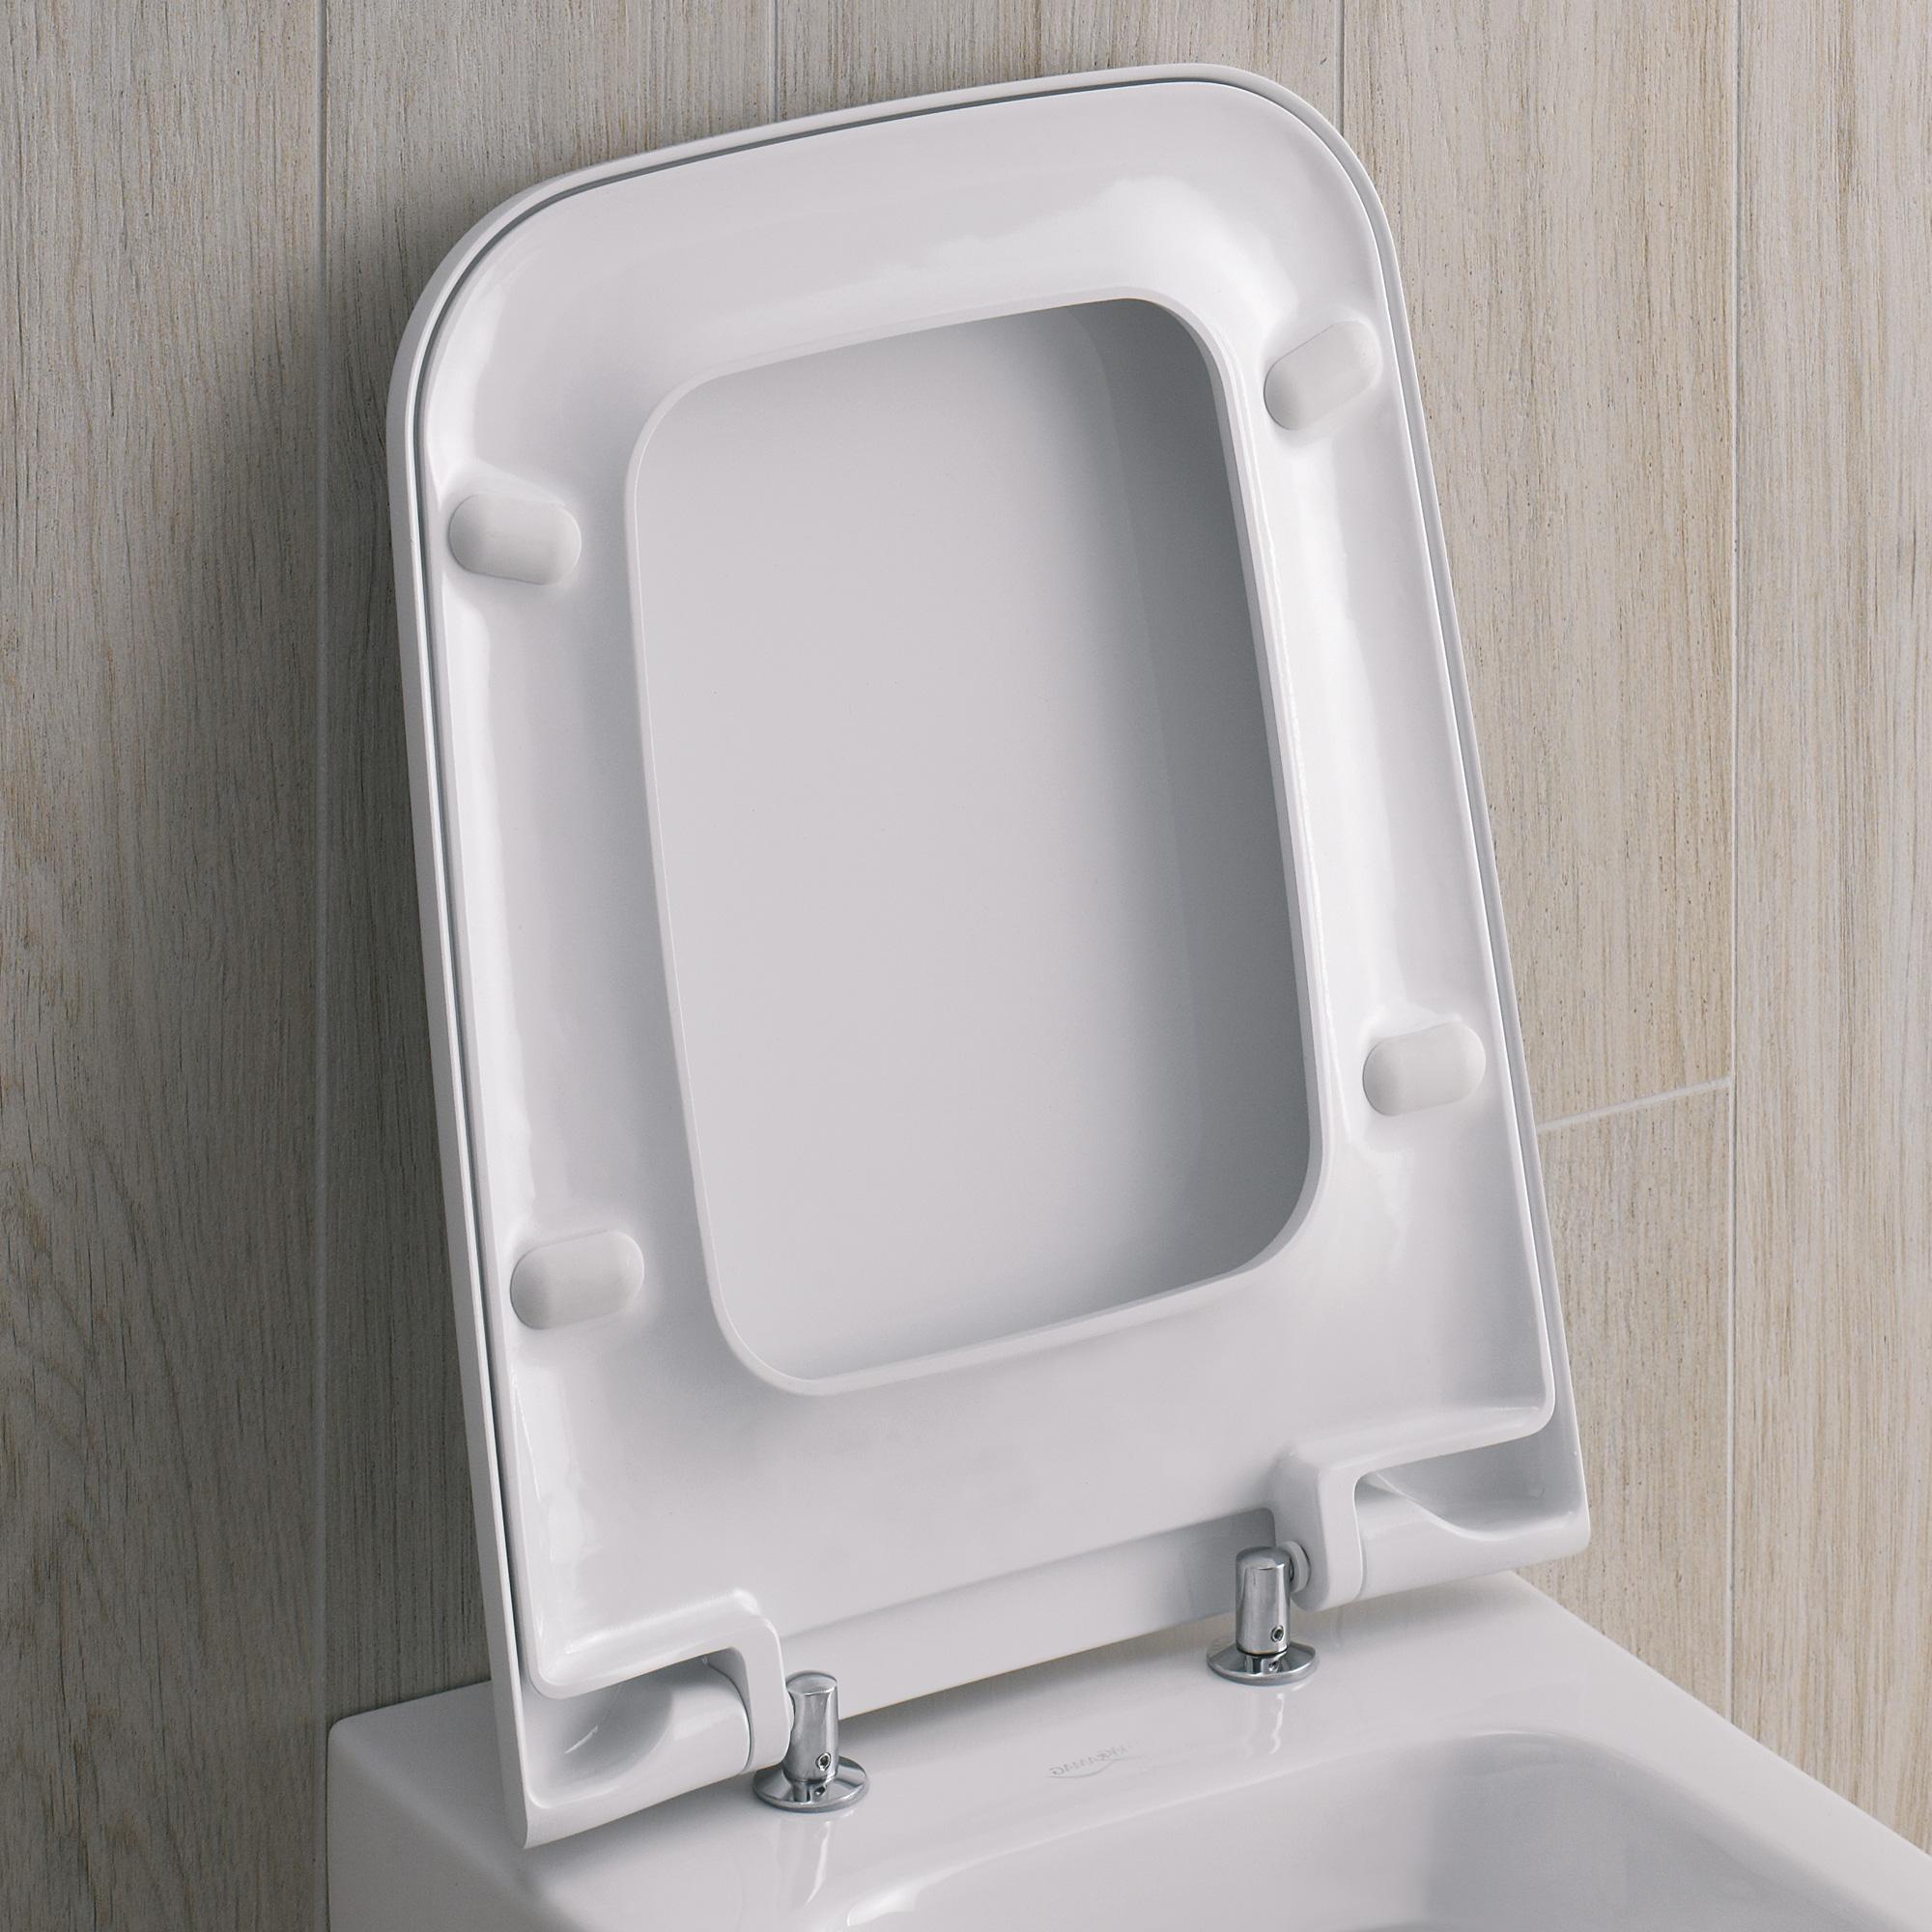 keramag it wc sitz mit absenkautomatik 571910000. Black Bedroom Furniture Sets. Home Design Ideas